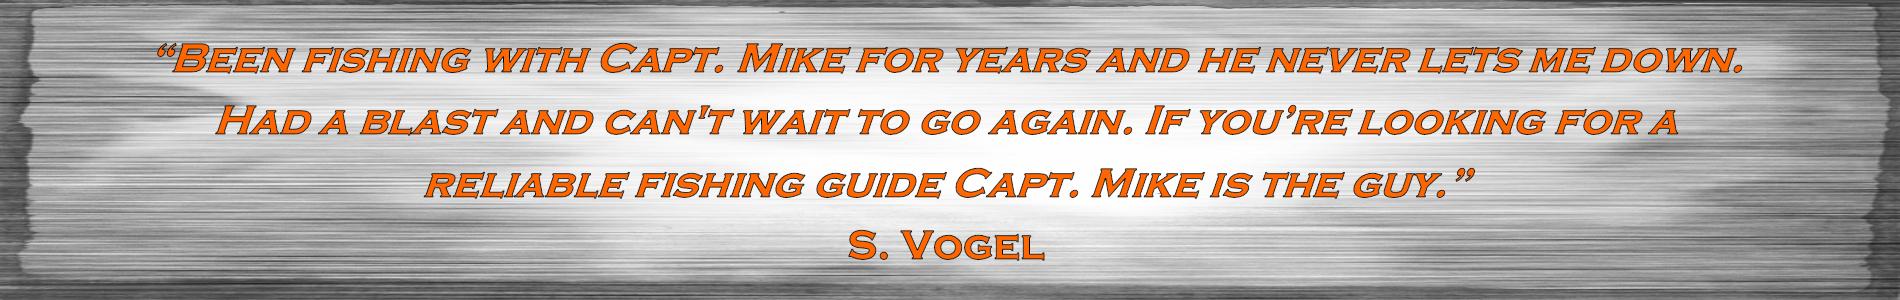 Vogel_Testimonial